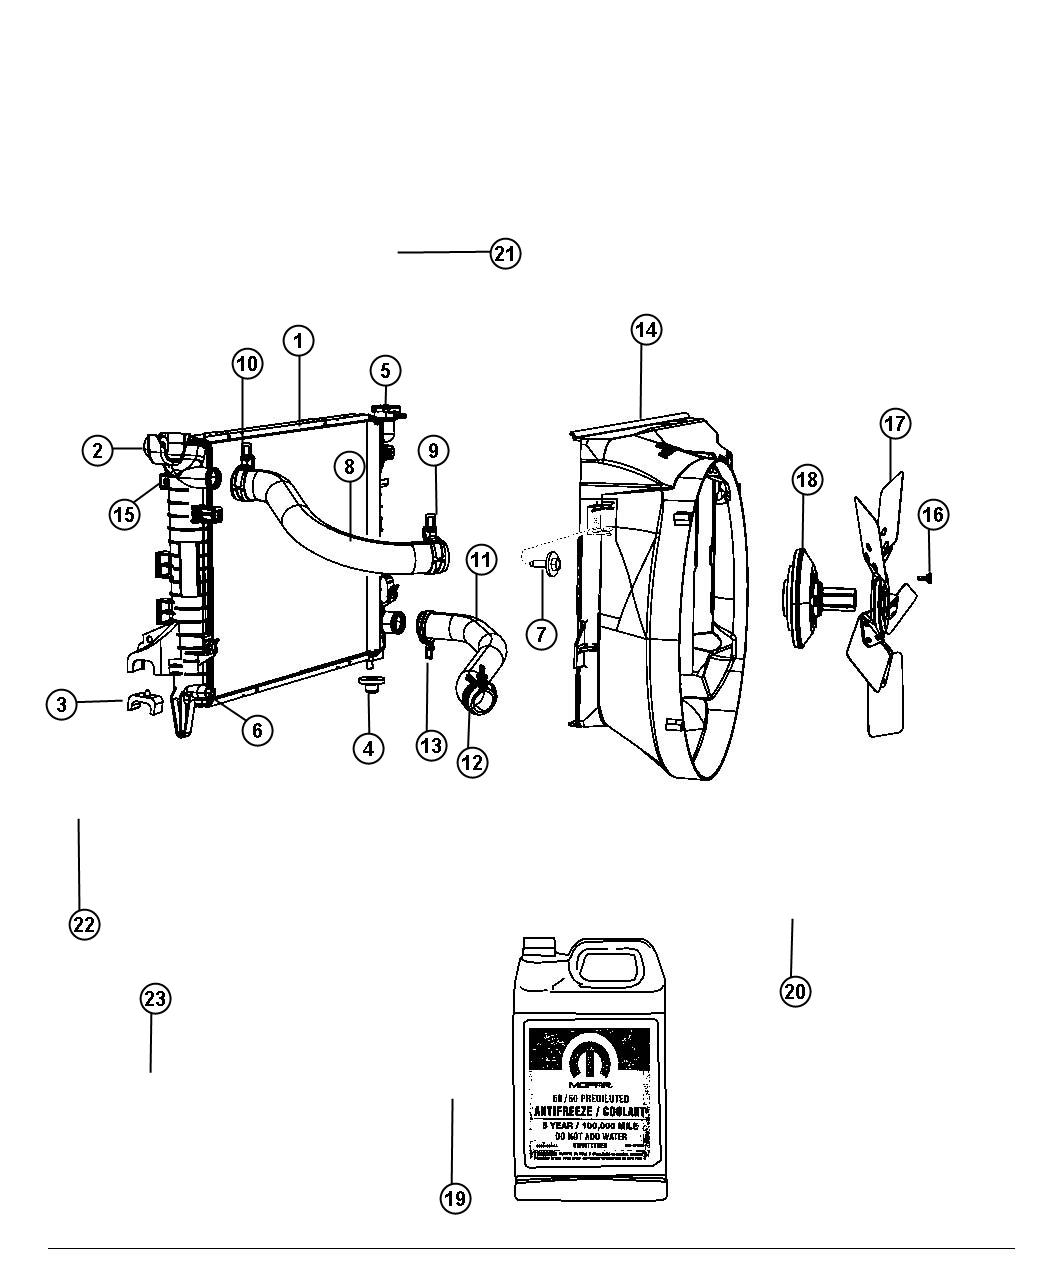 Radiator And Related Parts 5 7l 5 7l V8 Hemi Vvt Engine